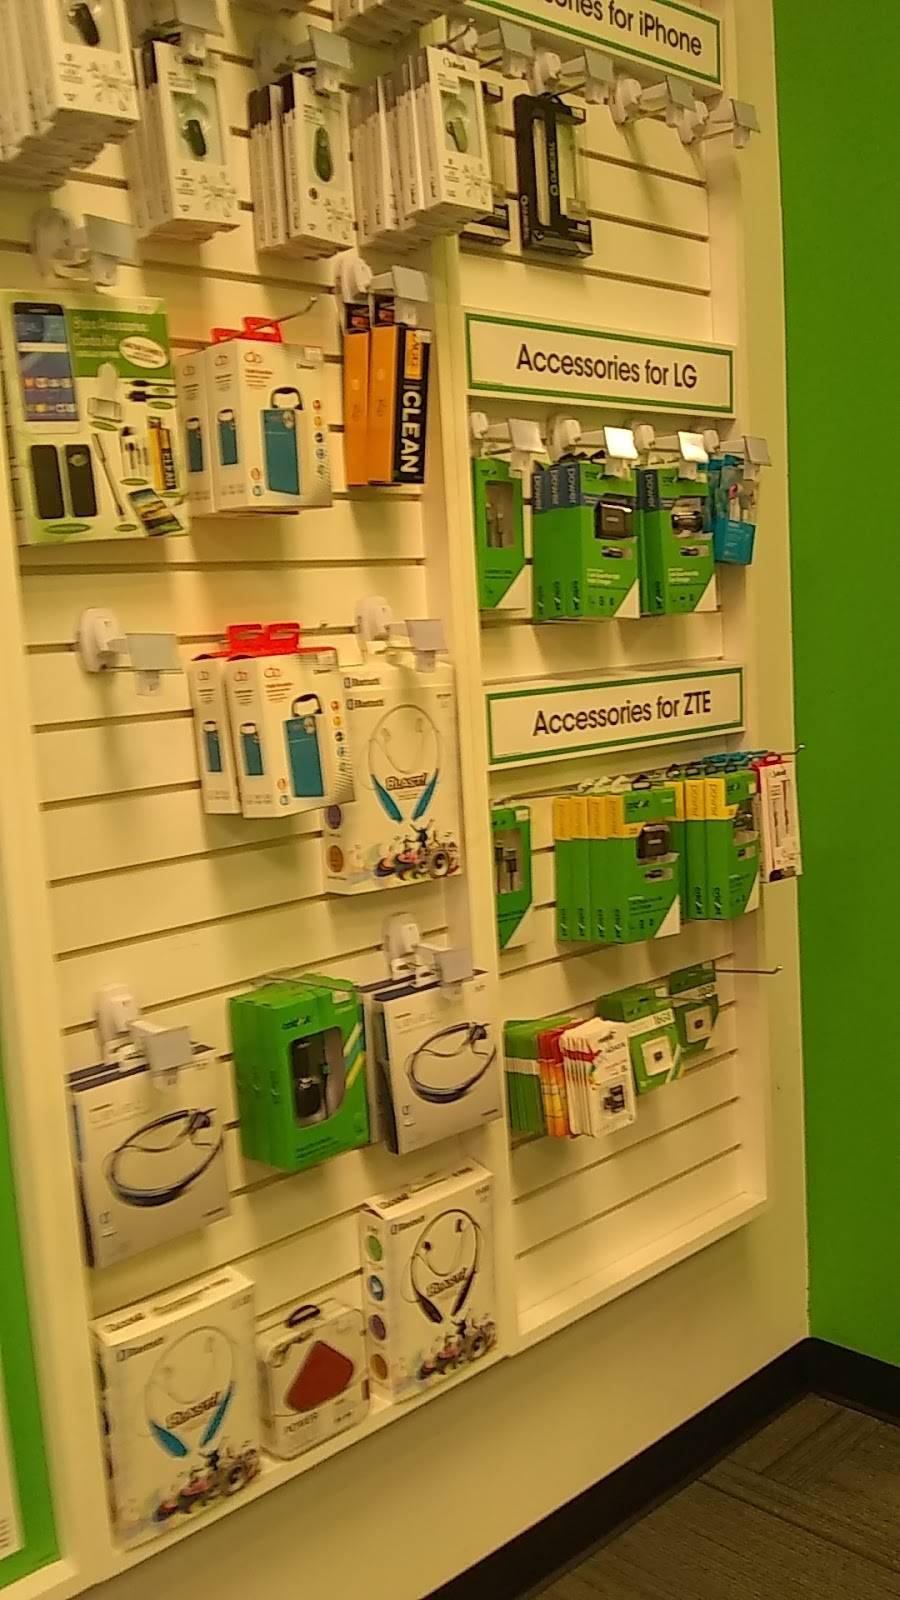 Cricket Wireless Authorized Retailer - store  | Photo 3 of 5 | Address: 5320 TX-359 Ste 101, Laredo, TX 78043, USA | Phone: (956) 722-3401